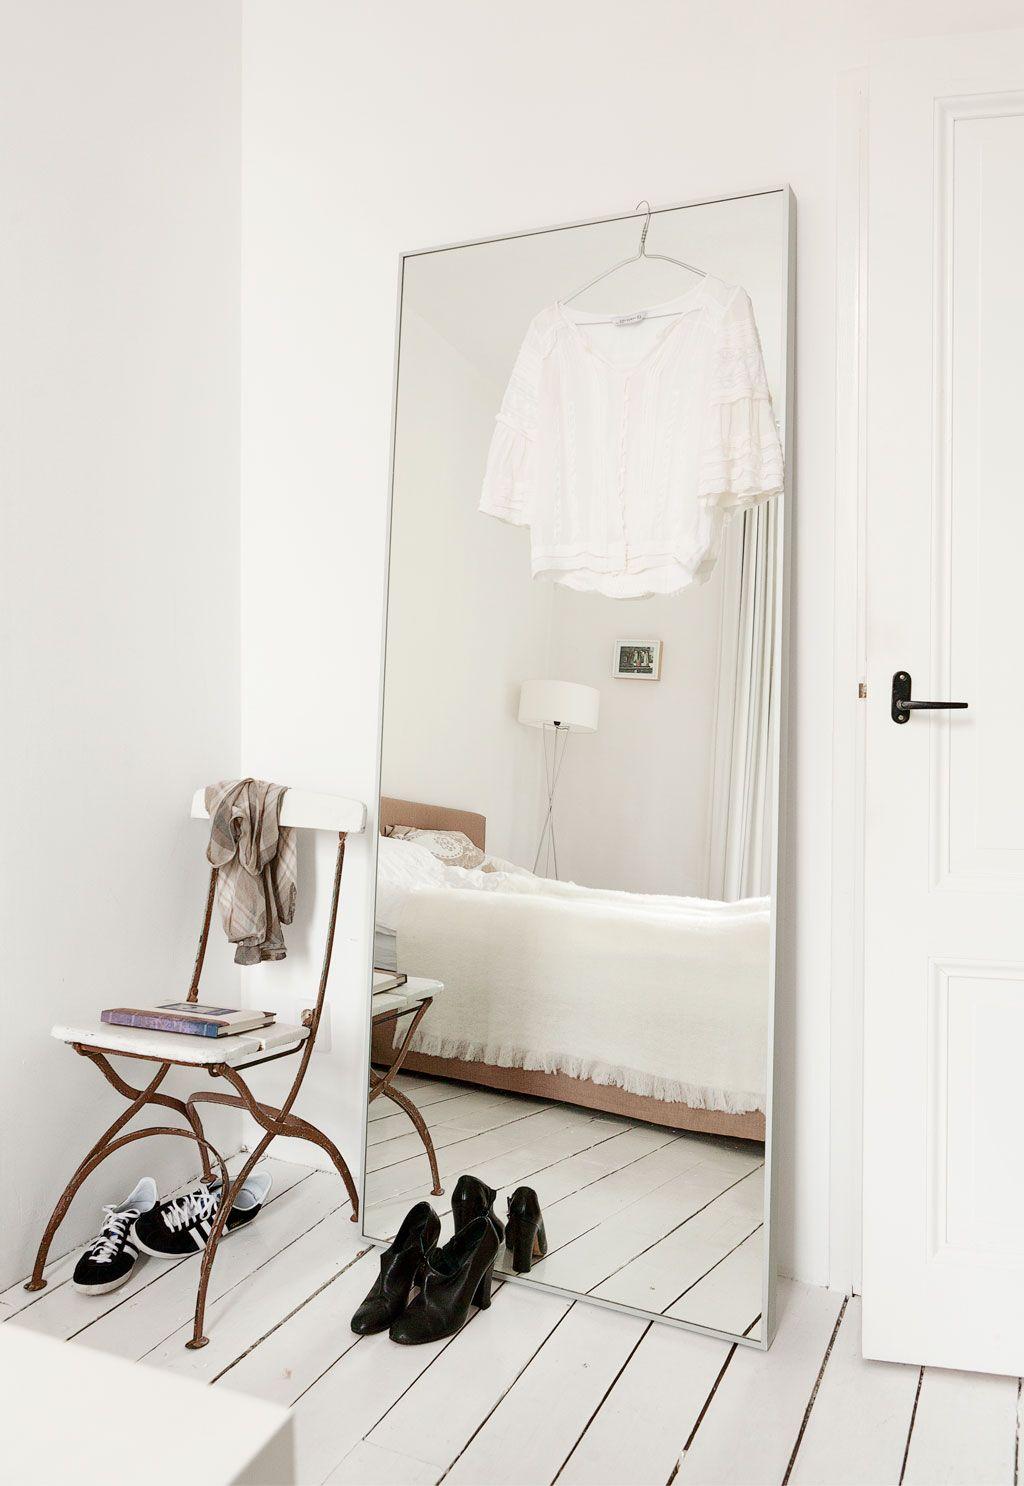 PRETTY // Dubble room house in Amsterdam Photographer: Jansje Klazinga | Stylist: Frans Uyterlinde